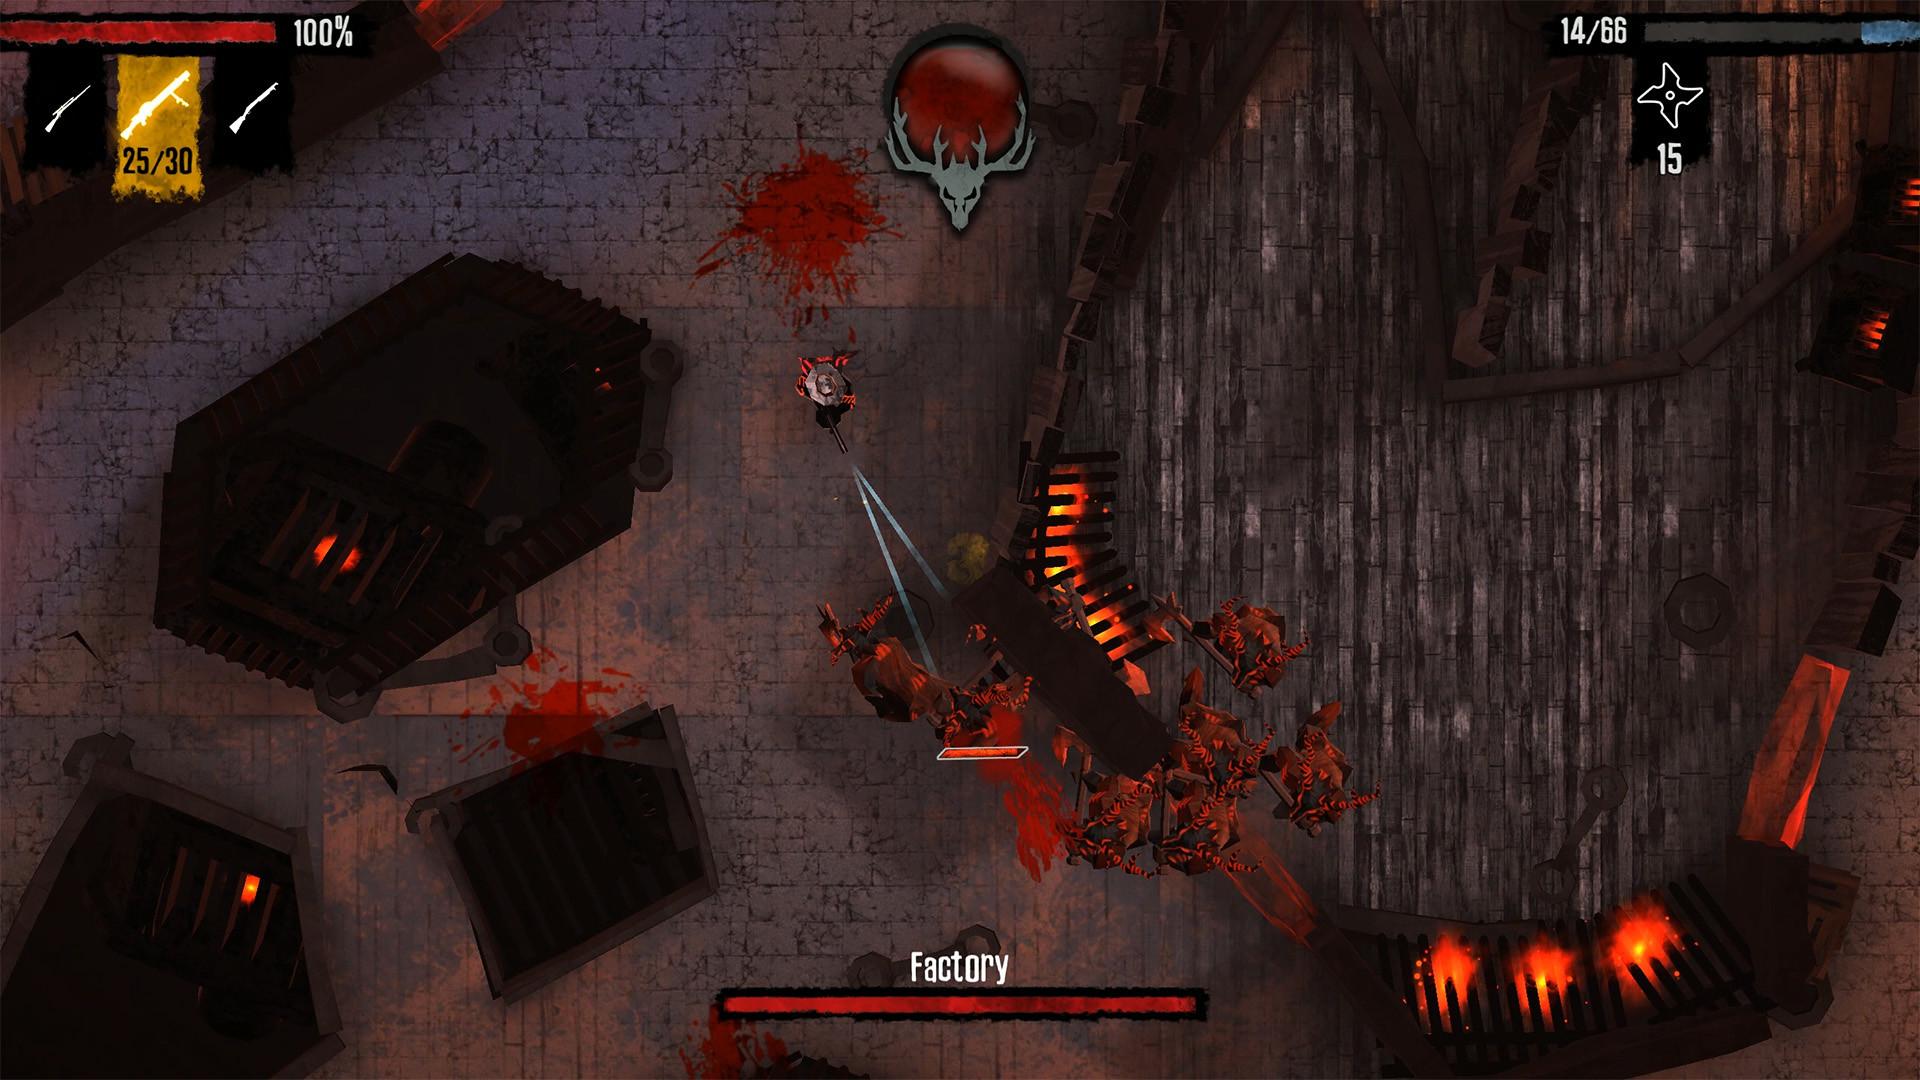 ritual-crown-of-horns-pc-screenshot-1